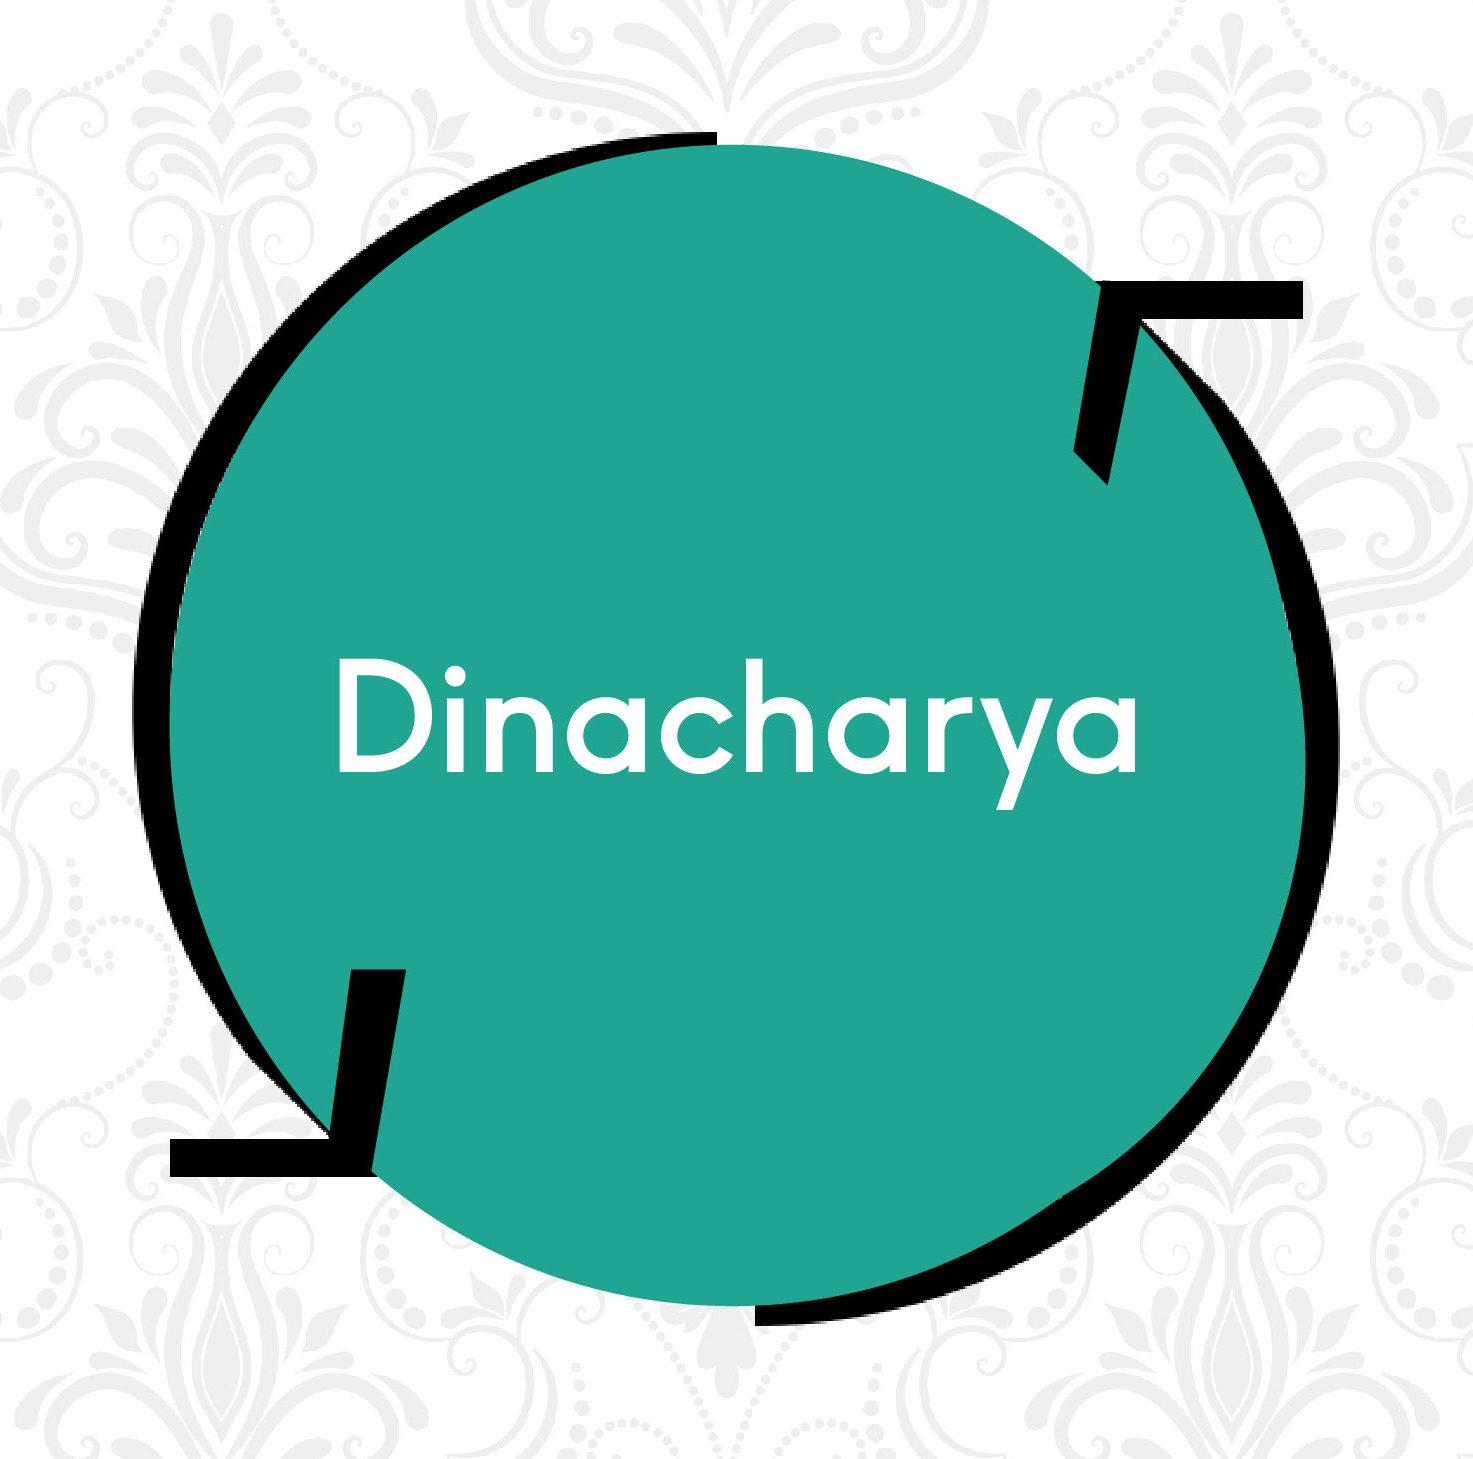 Dinacharya